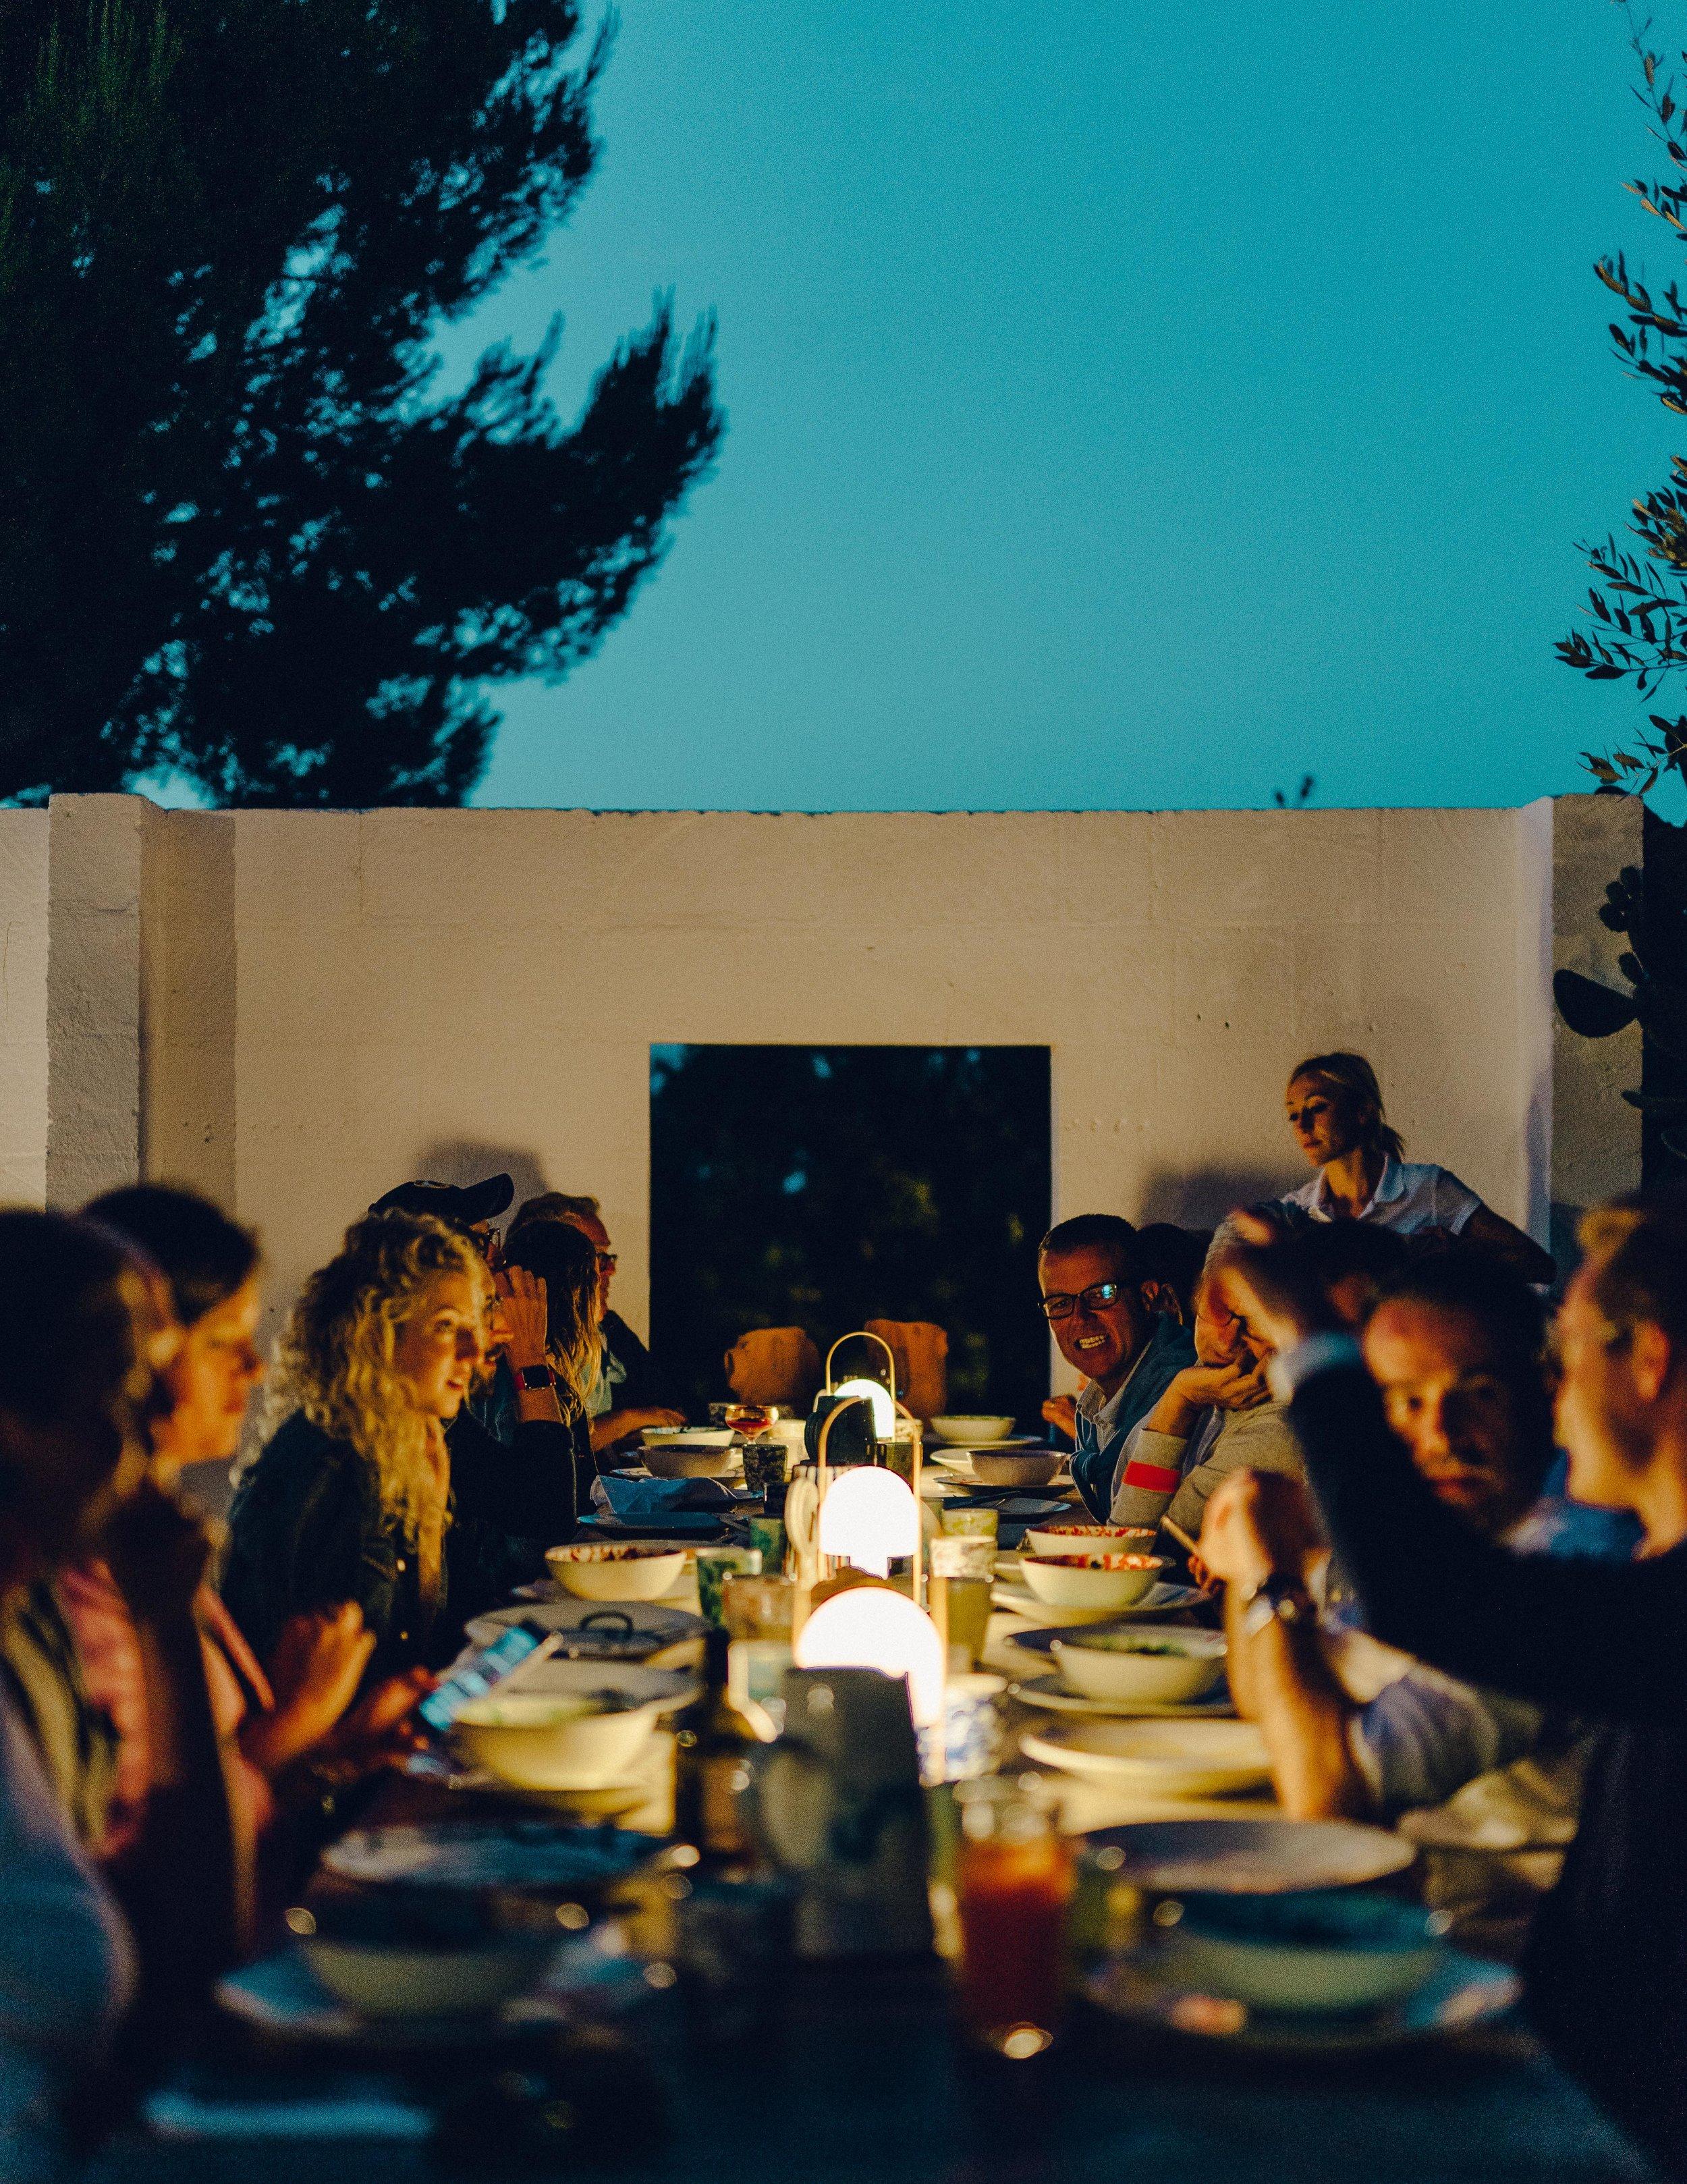 ASROSENVINGE_Roadtrip_Italy_Puglia_Masseria_Moroseta-06874.jpg